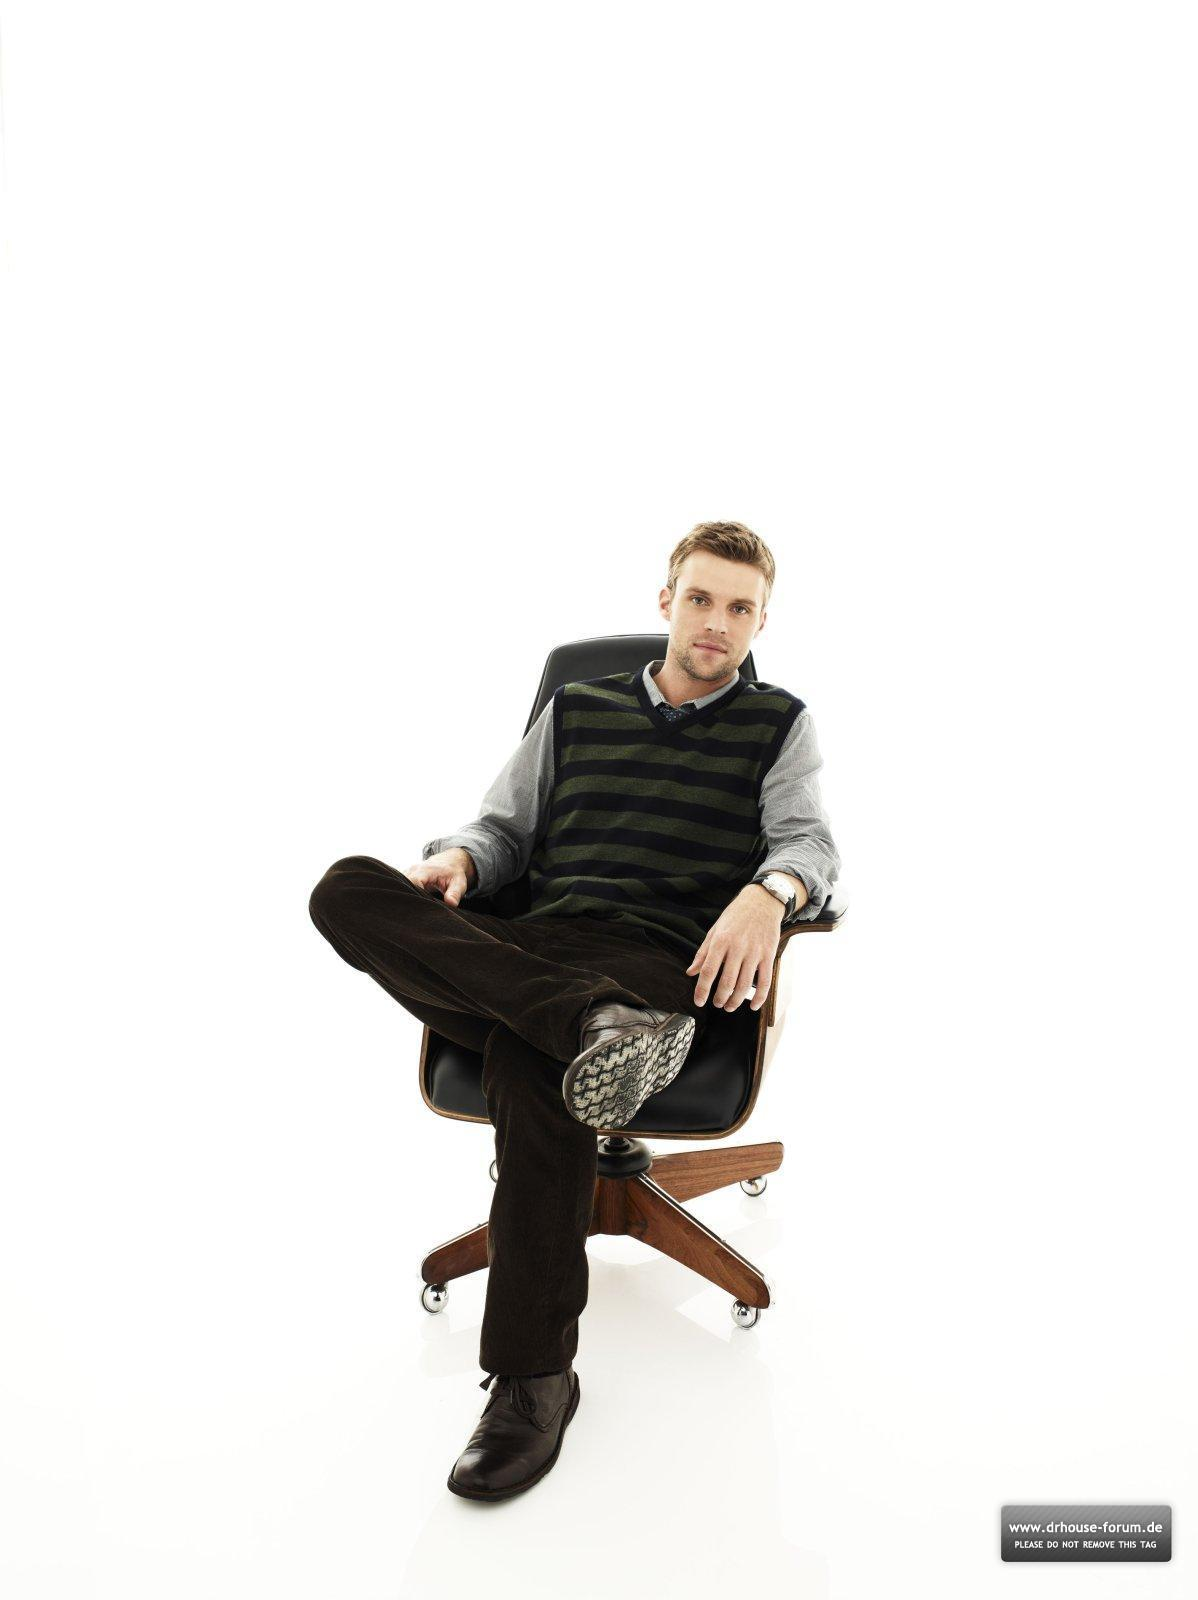 House Season 7: Promotional photos